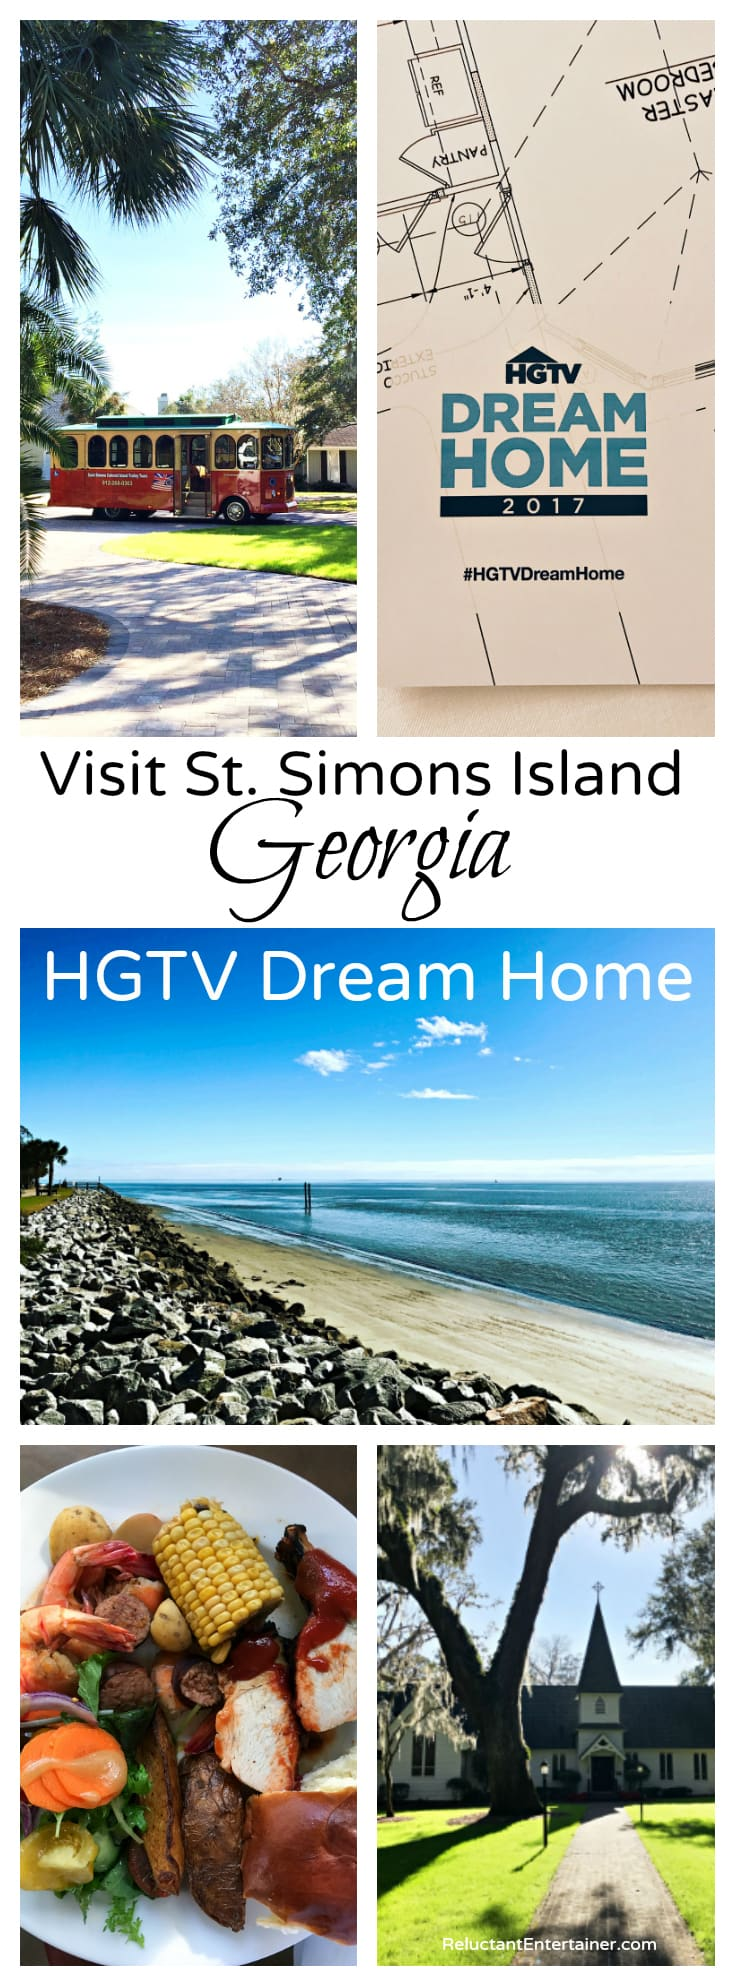 Visit St. Simons Island, Georgia, HGTV Dream Home